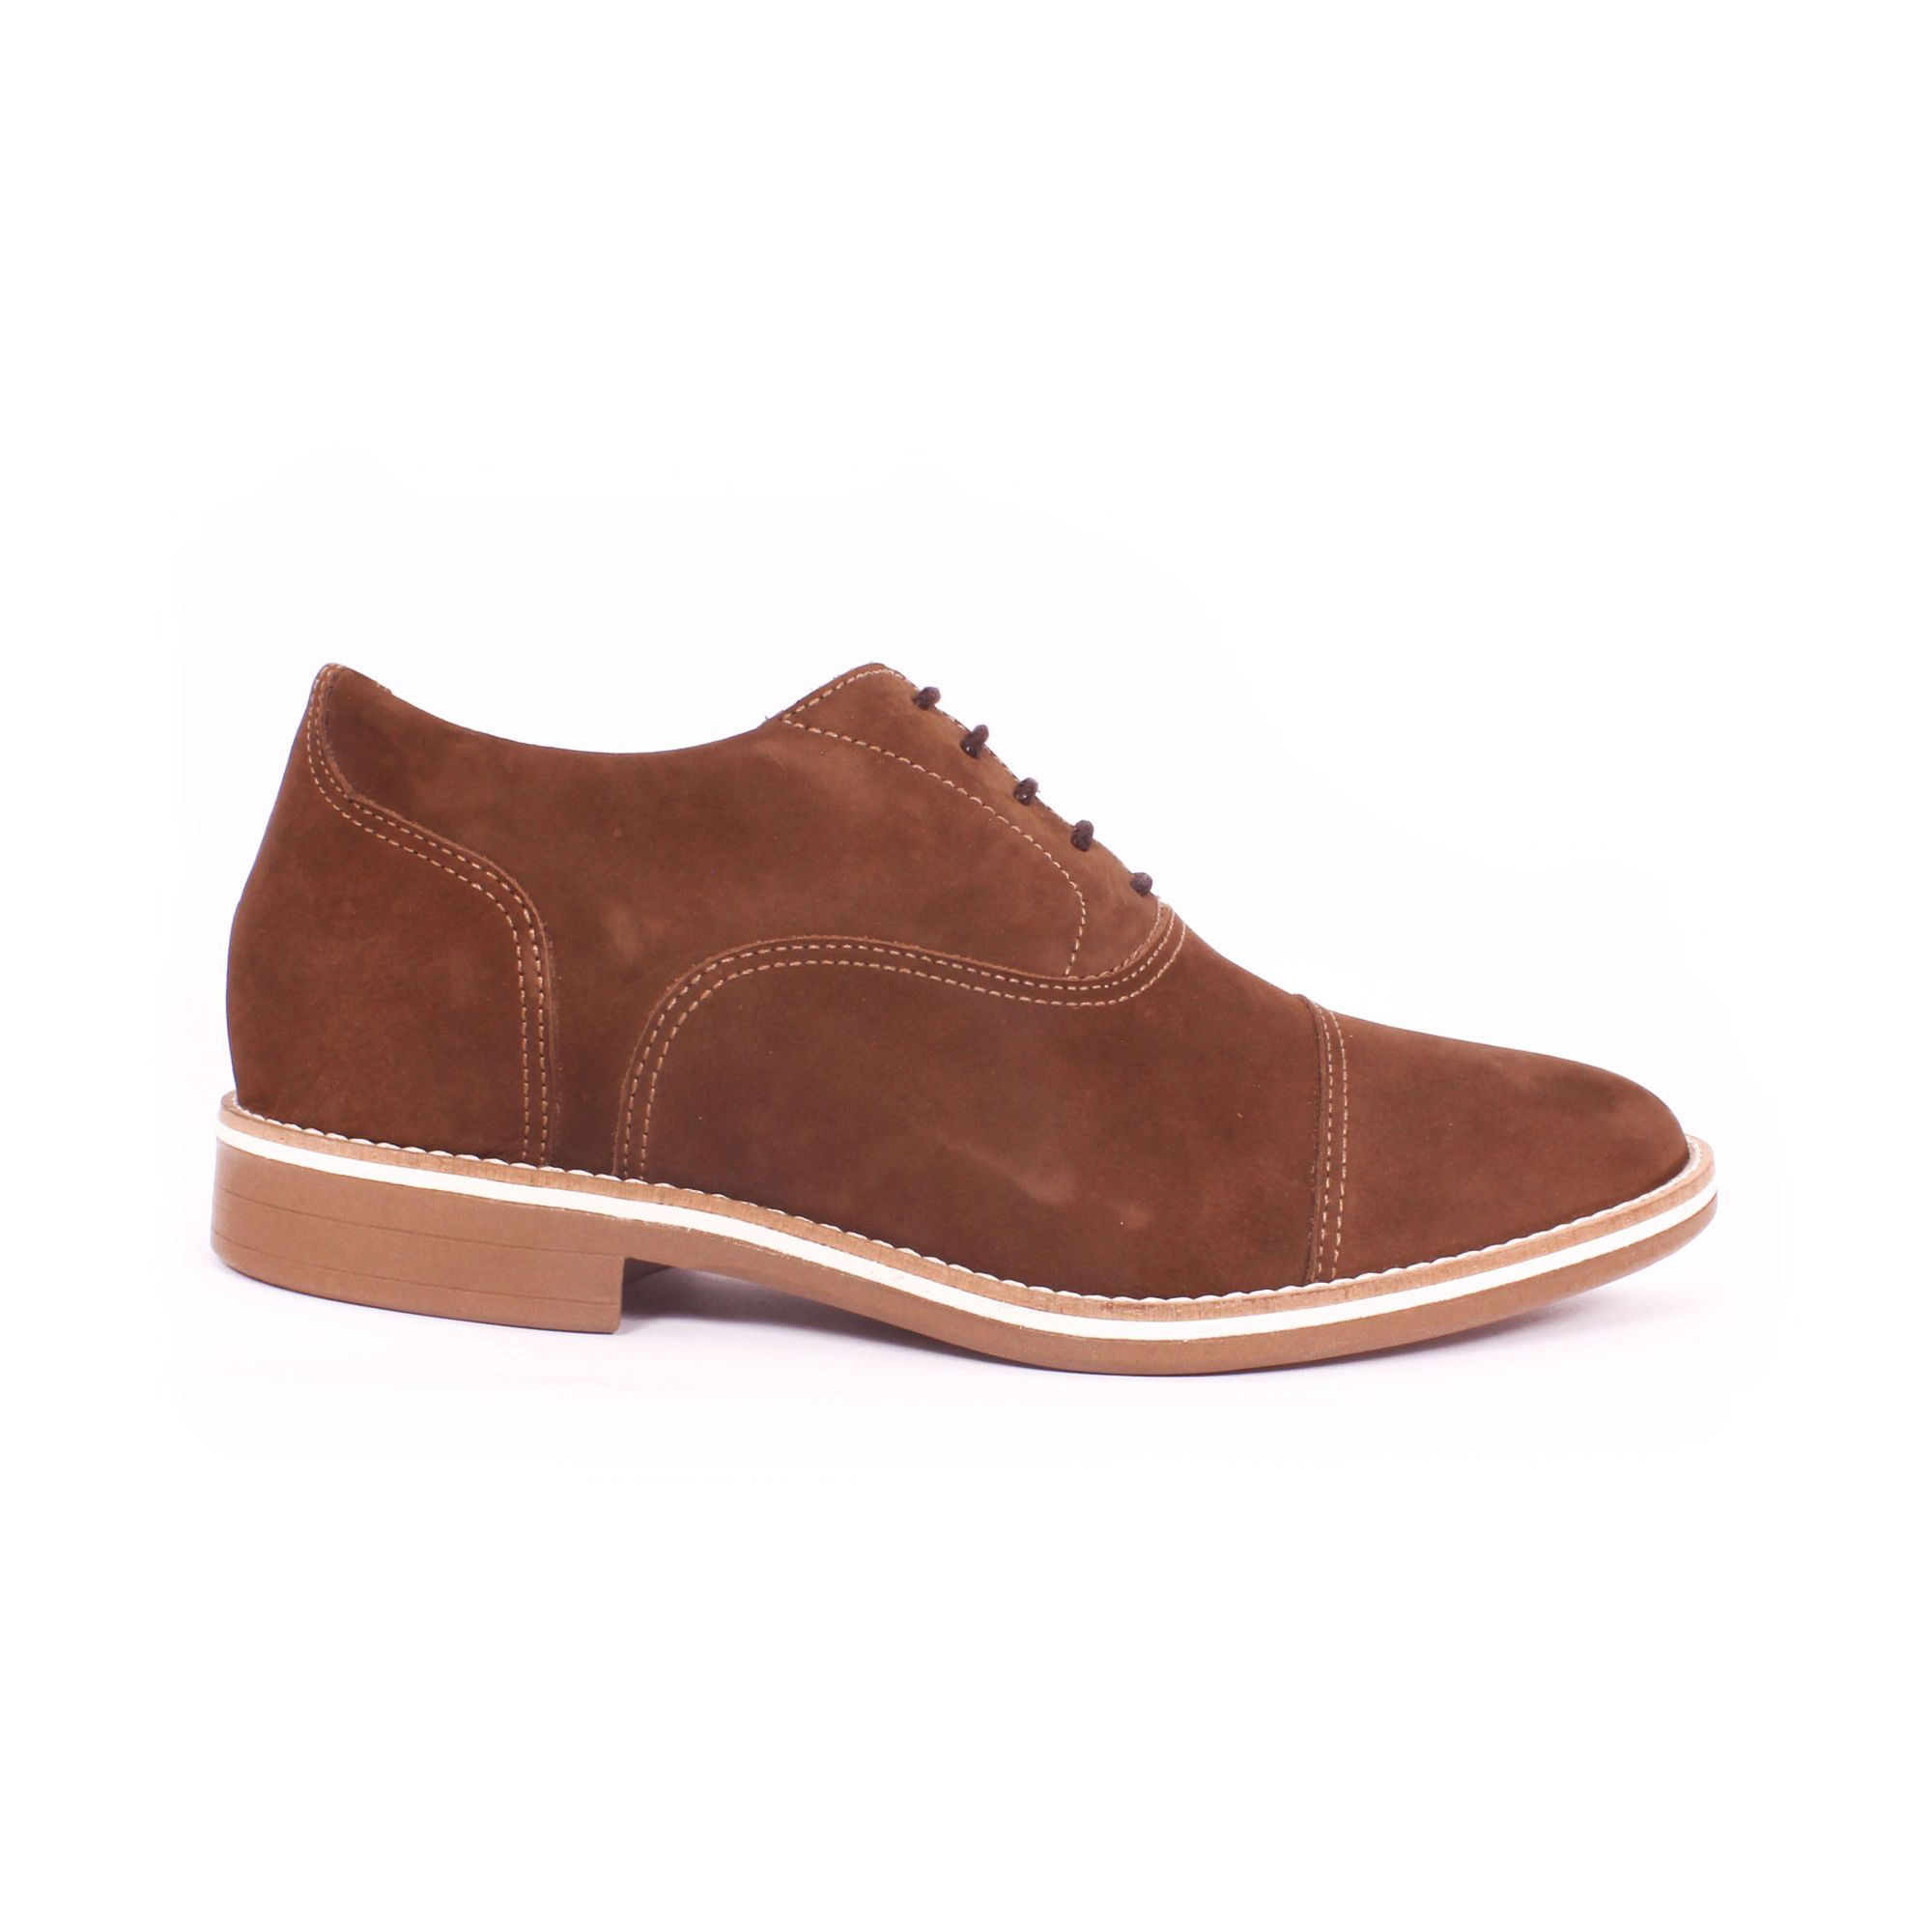 Zapato Casual Hippie Café Max Denegri +7cm de Altura_70871